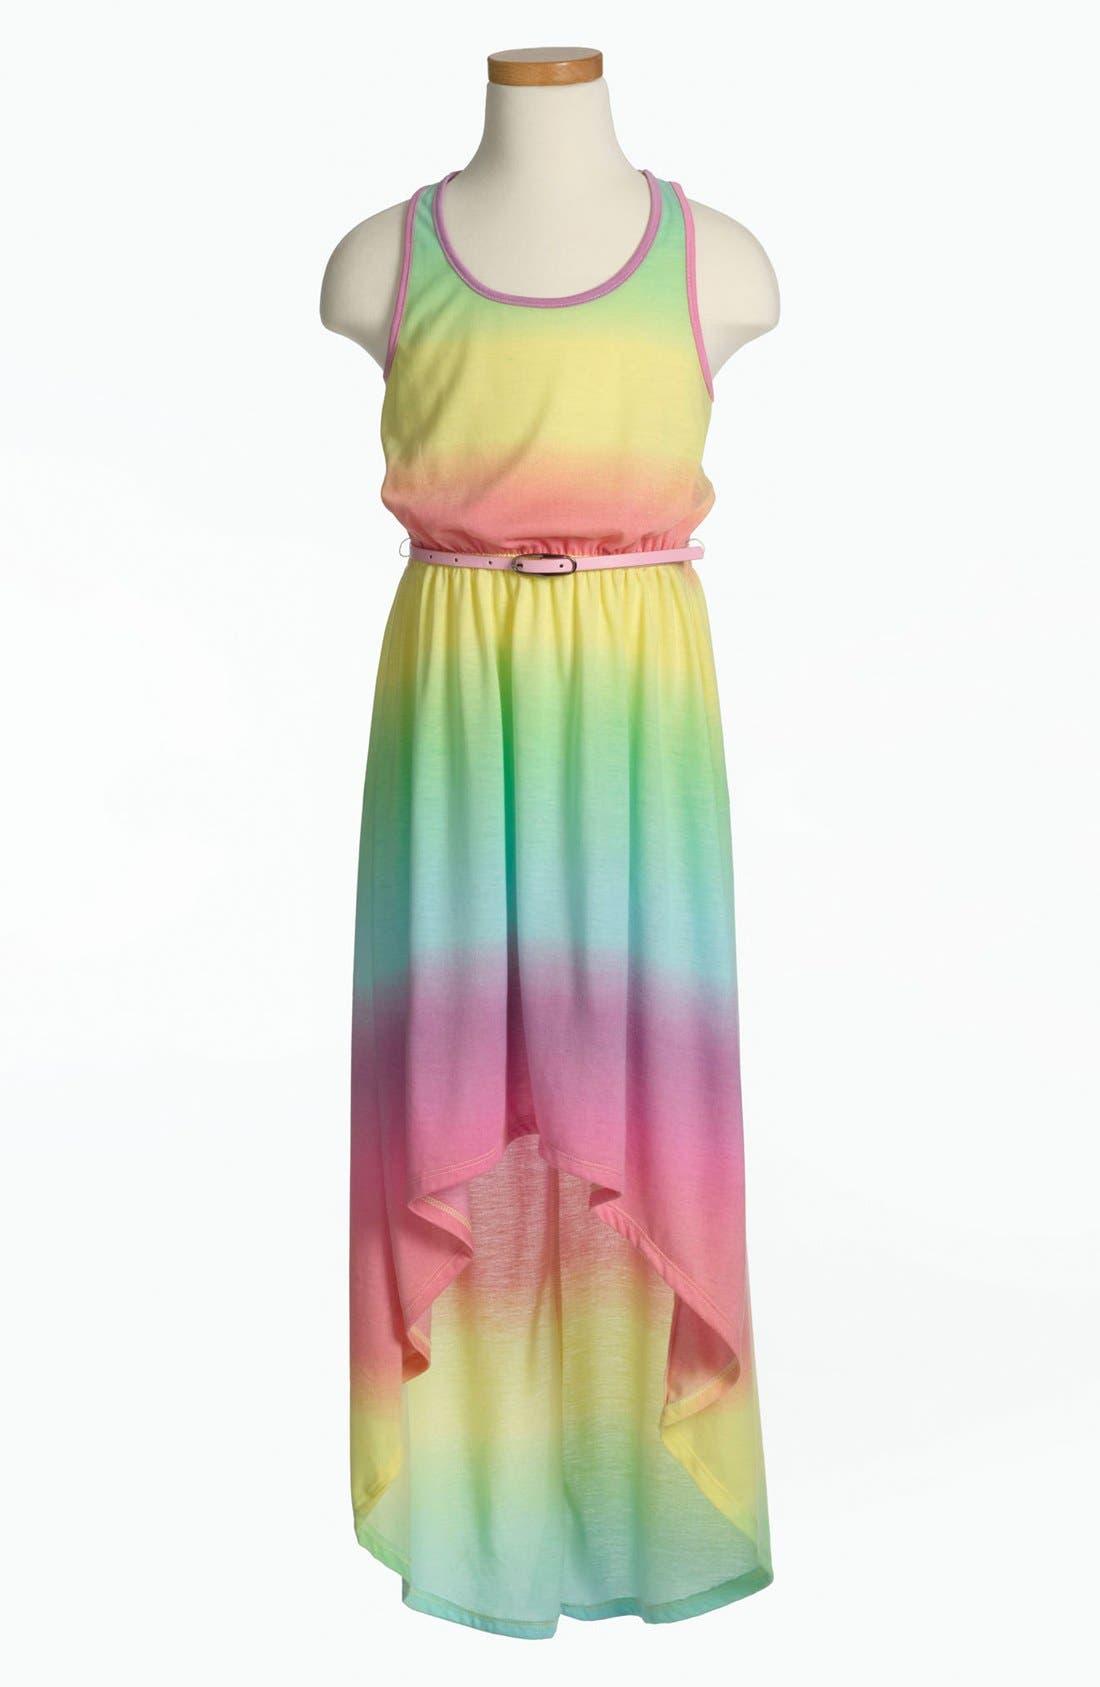 Alternate Image 1 Selected - Fire Tie Dye Dress (Little Girls & Big Girls)